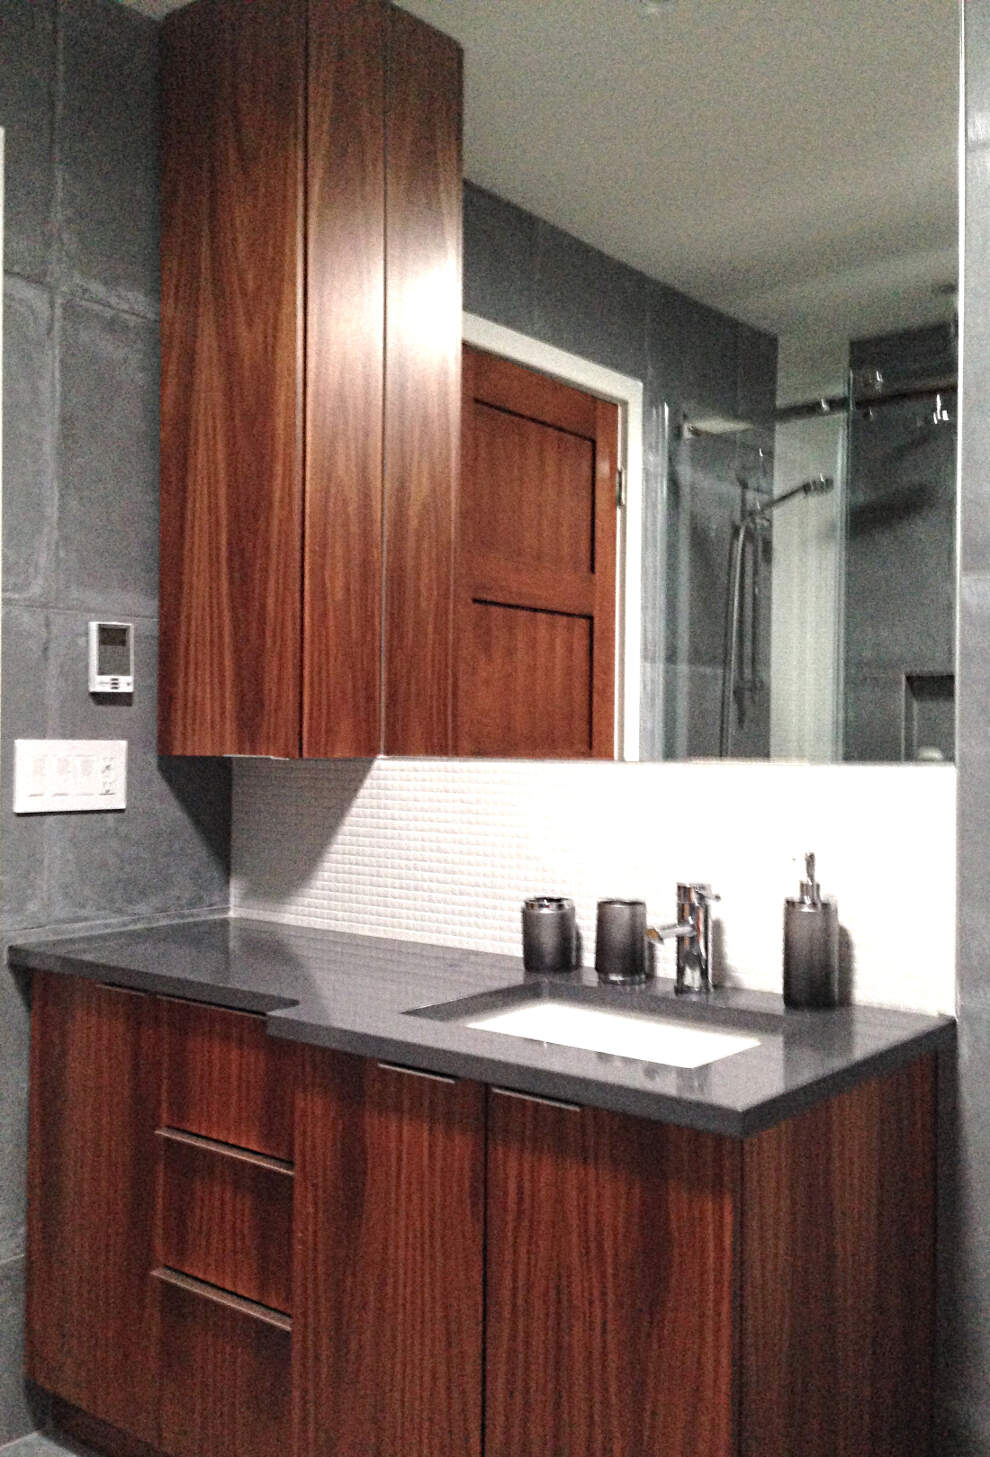 multi mod les complice de votre cuisine. Black Bedroom Furniture Sets. Home Design Ideas